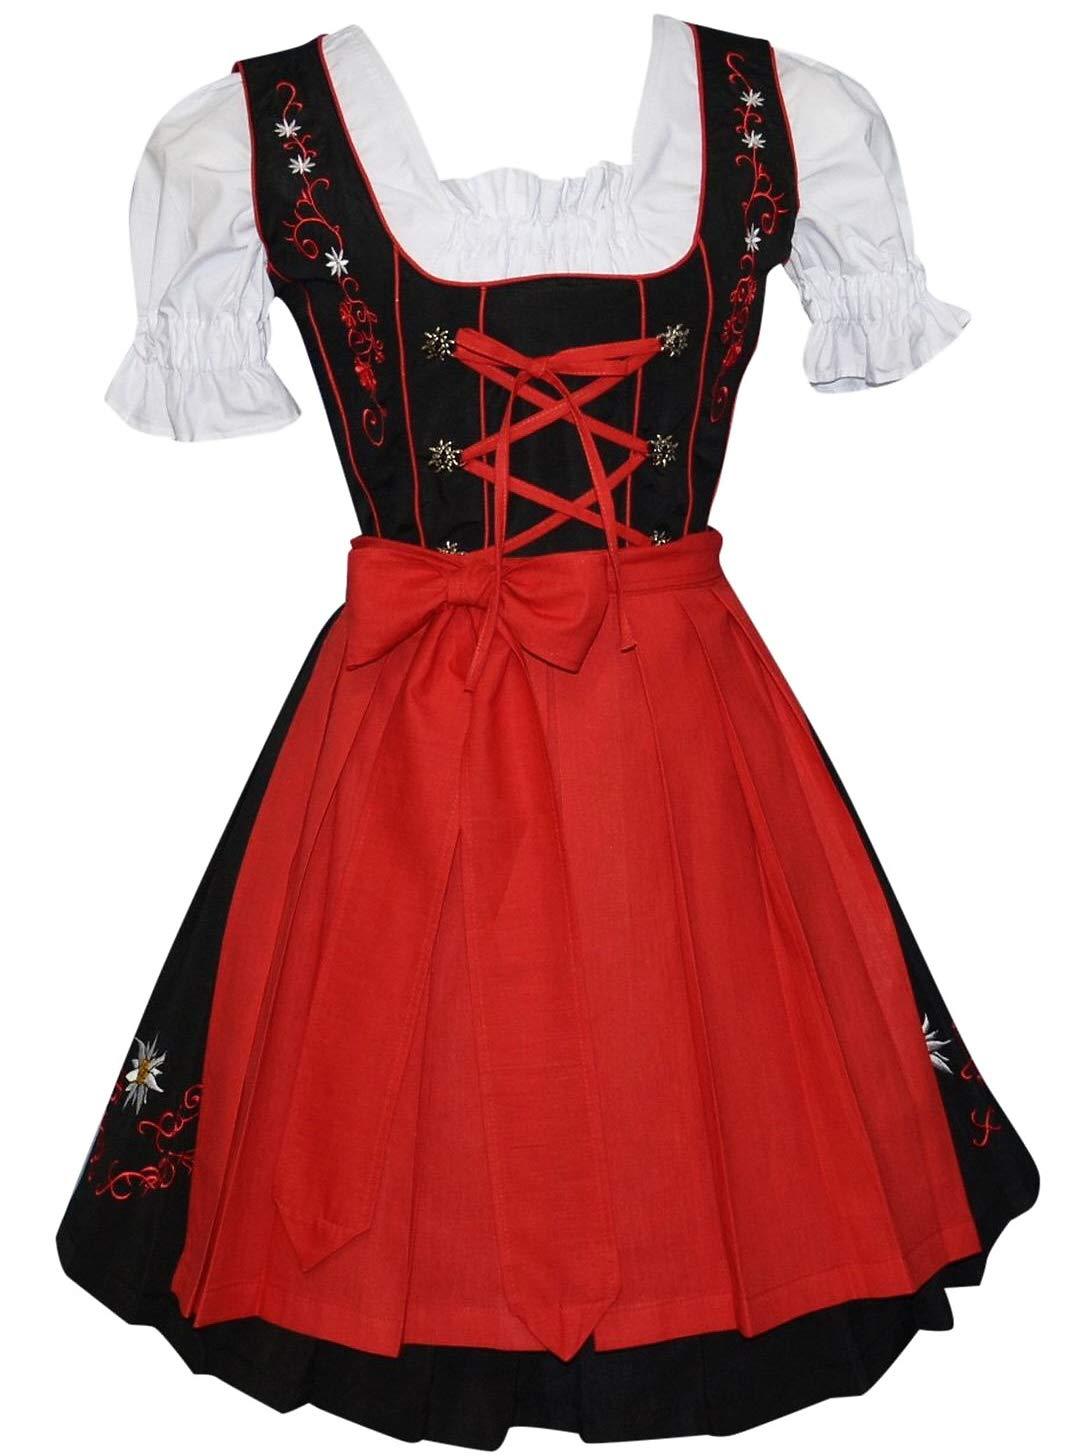 Edelweiss Creek 3-Piece Short German Party Oktoberfest Dirndl Dress Black & Red (14)